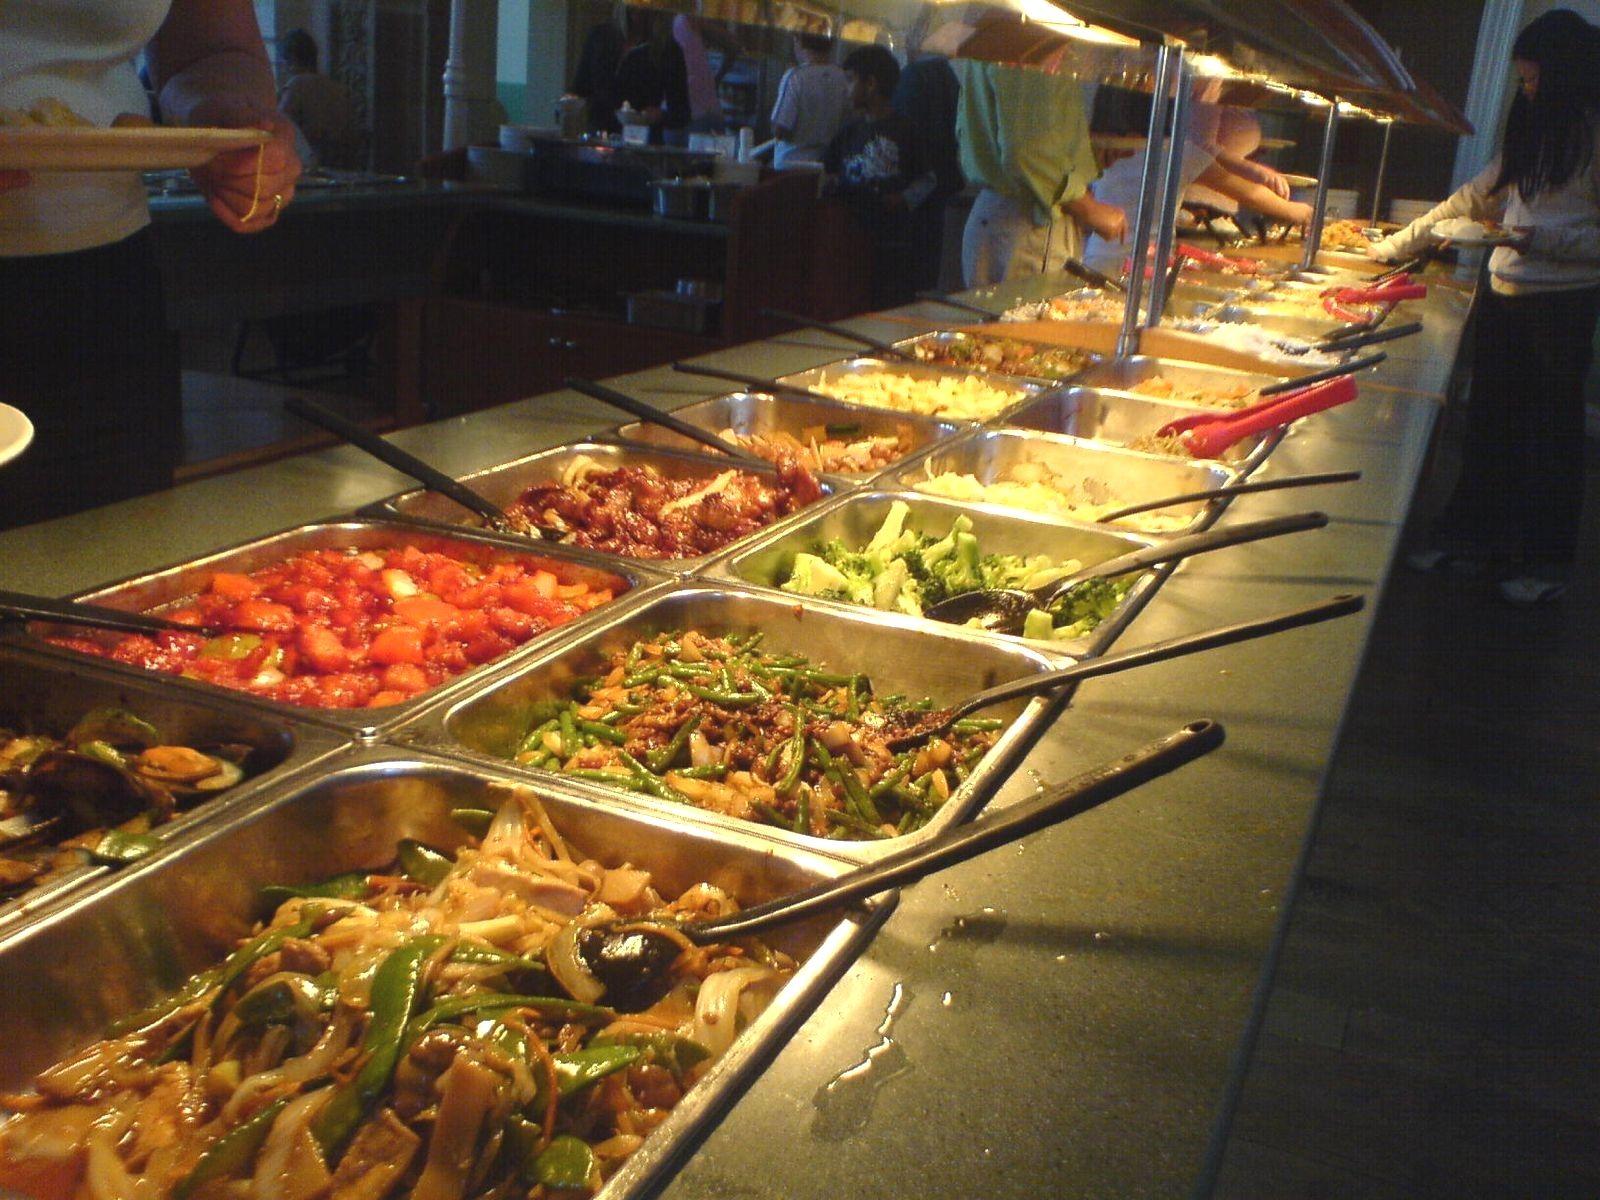 Image 20190330 094005 Taiwanese Food 536 อาหาร Food Recipes Taiwanese Food Zougank Eis Blog Mei Vill Informatioun Chinese Buffet Food Food Challenge